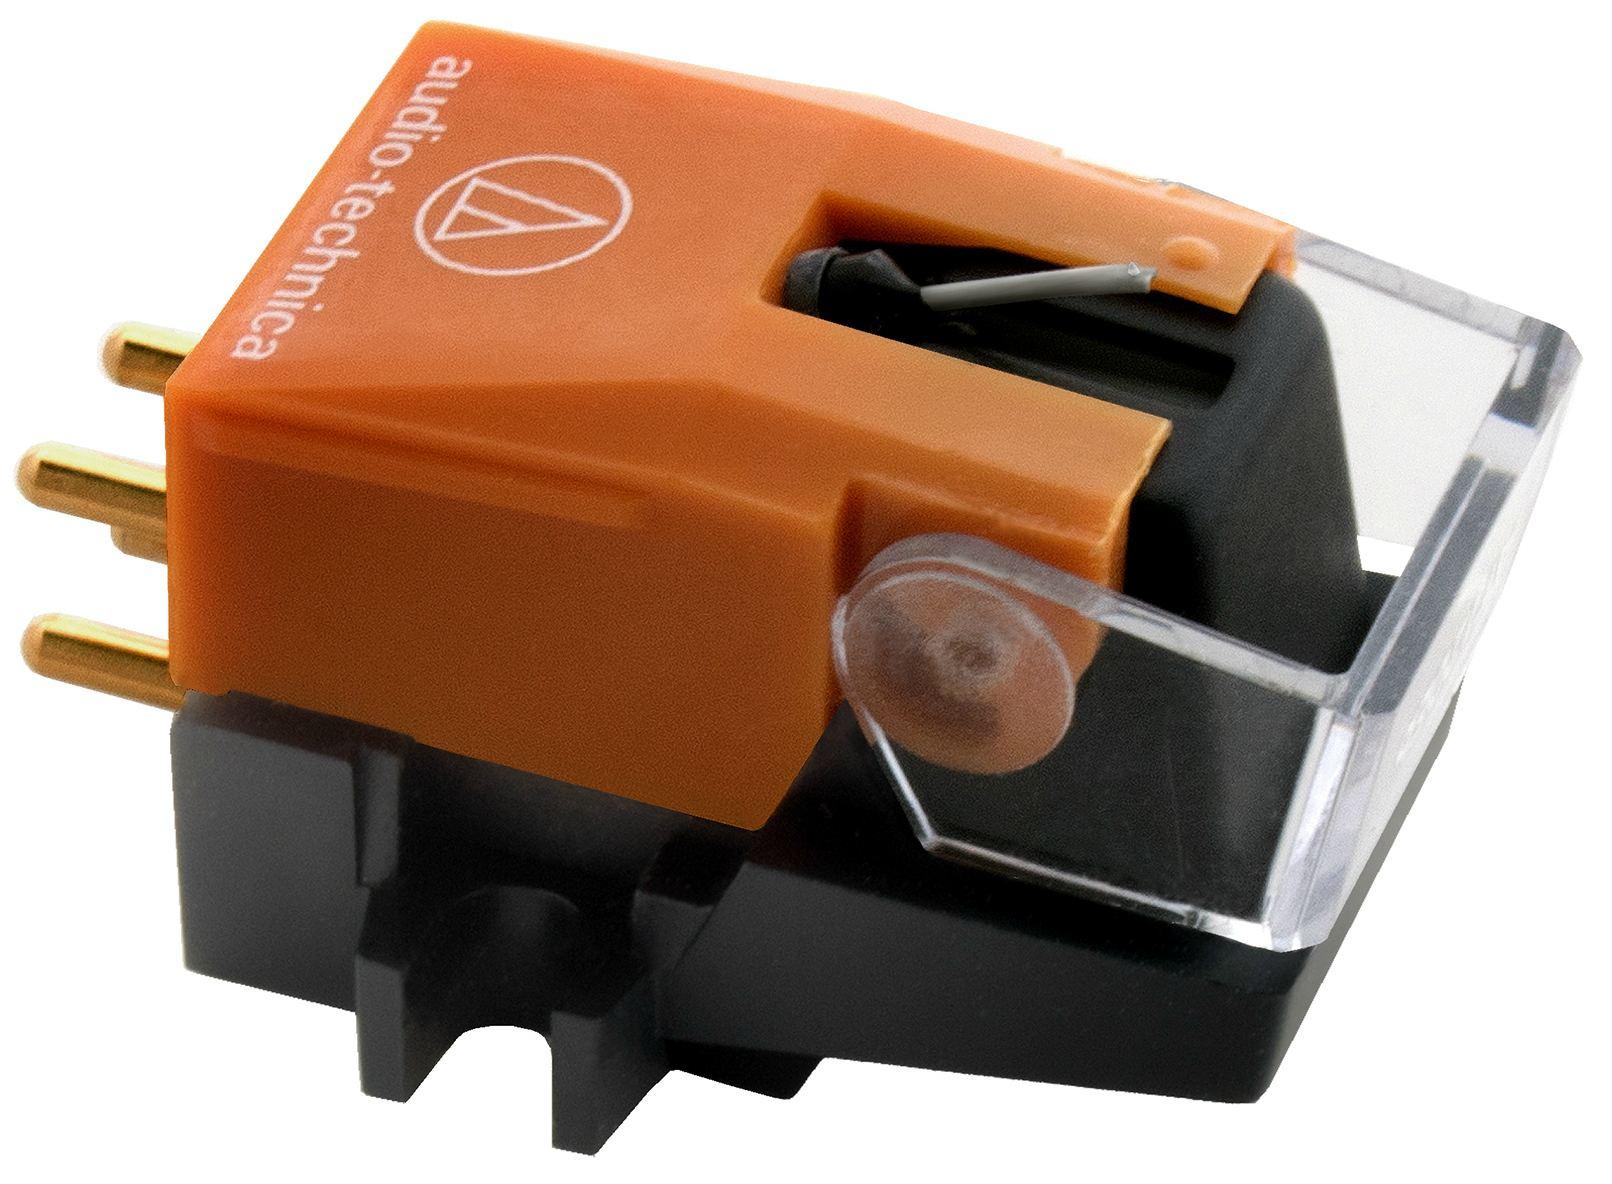 Audio-Technica AT120Eb - головка звукоснимателя